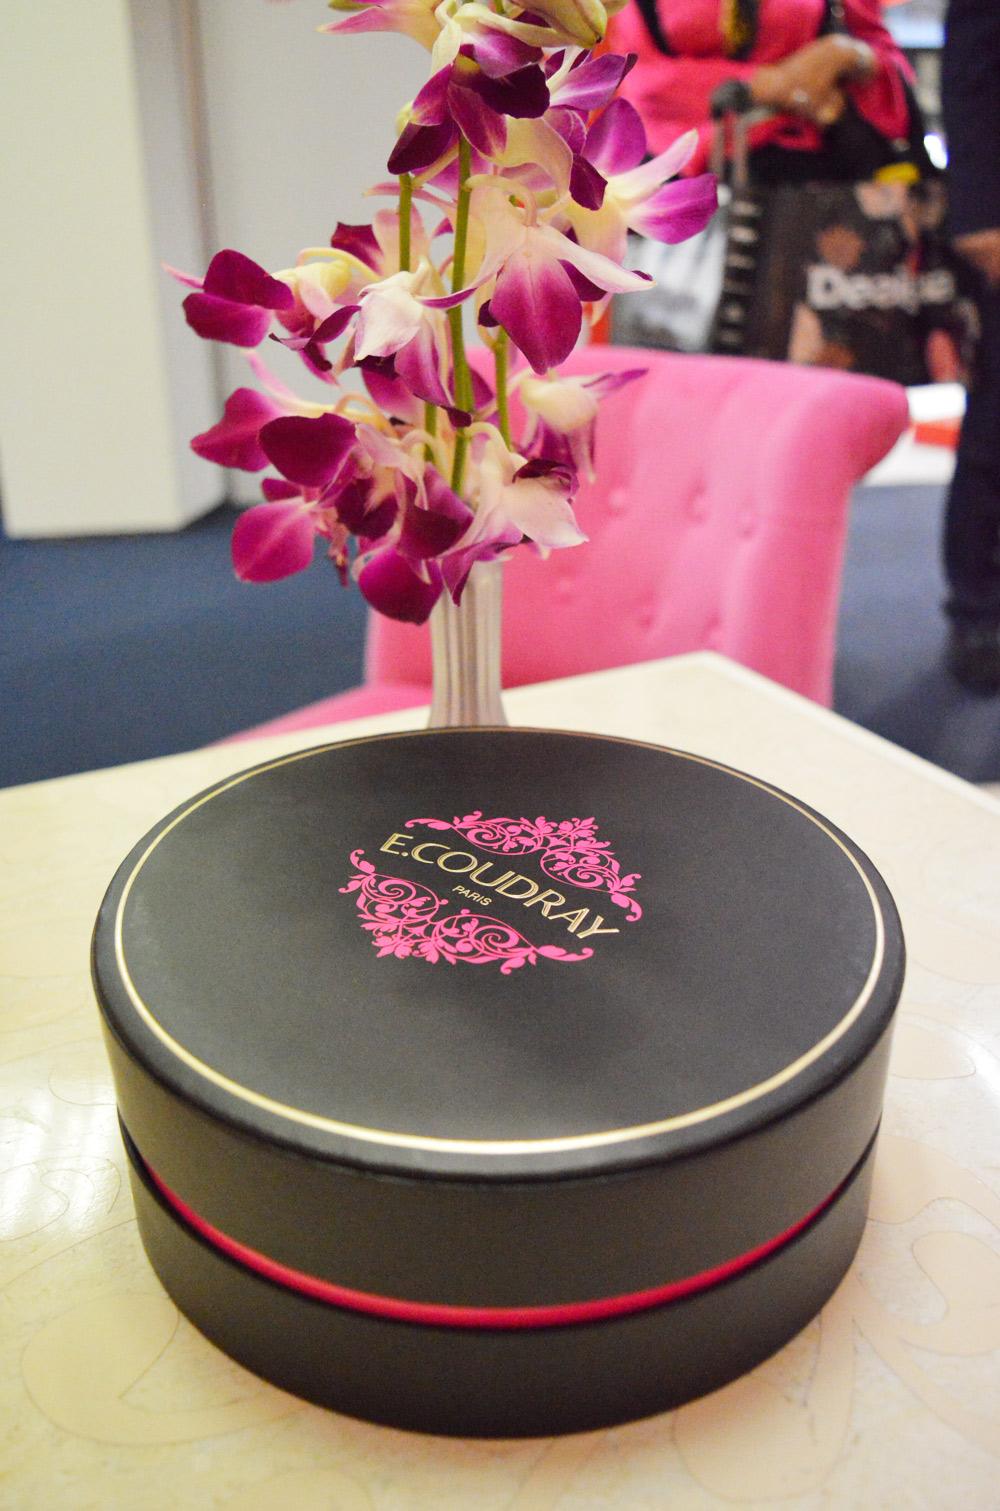 Ylang Ylang E Coudray Perfume A New Fragrance For Women